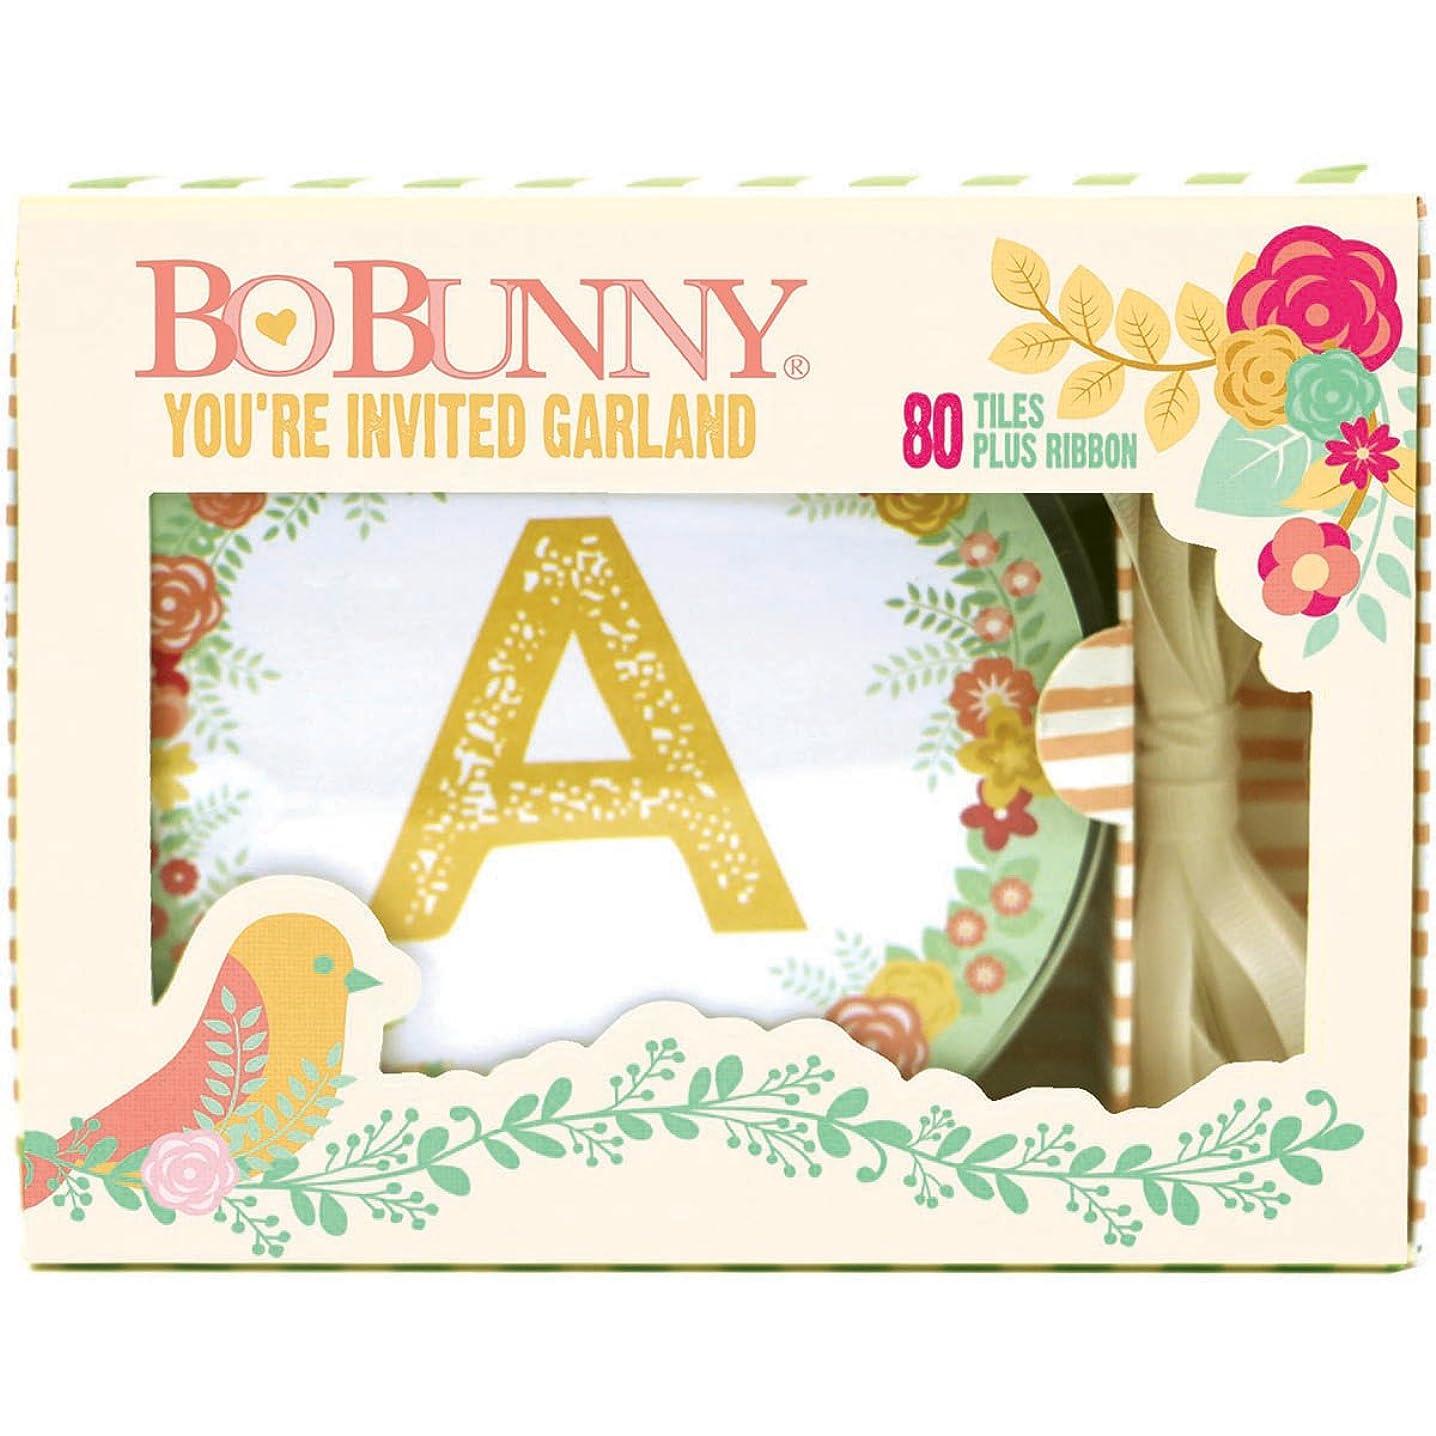 Bo Bunny Garland Box Set You're Invited